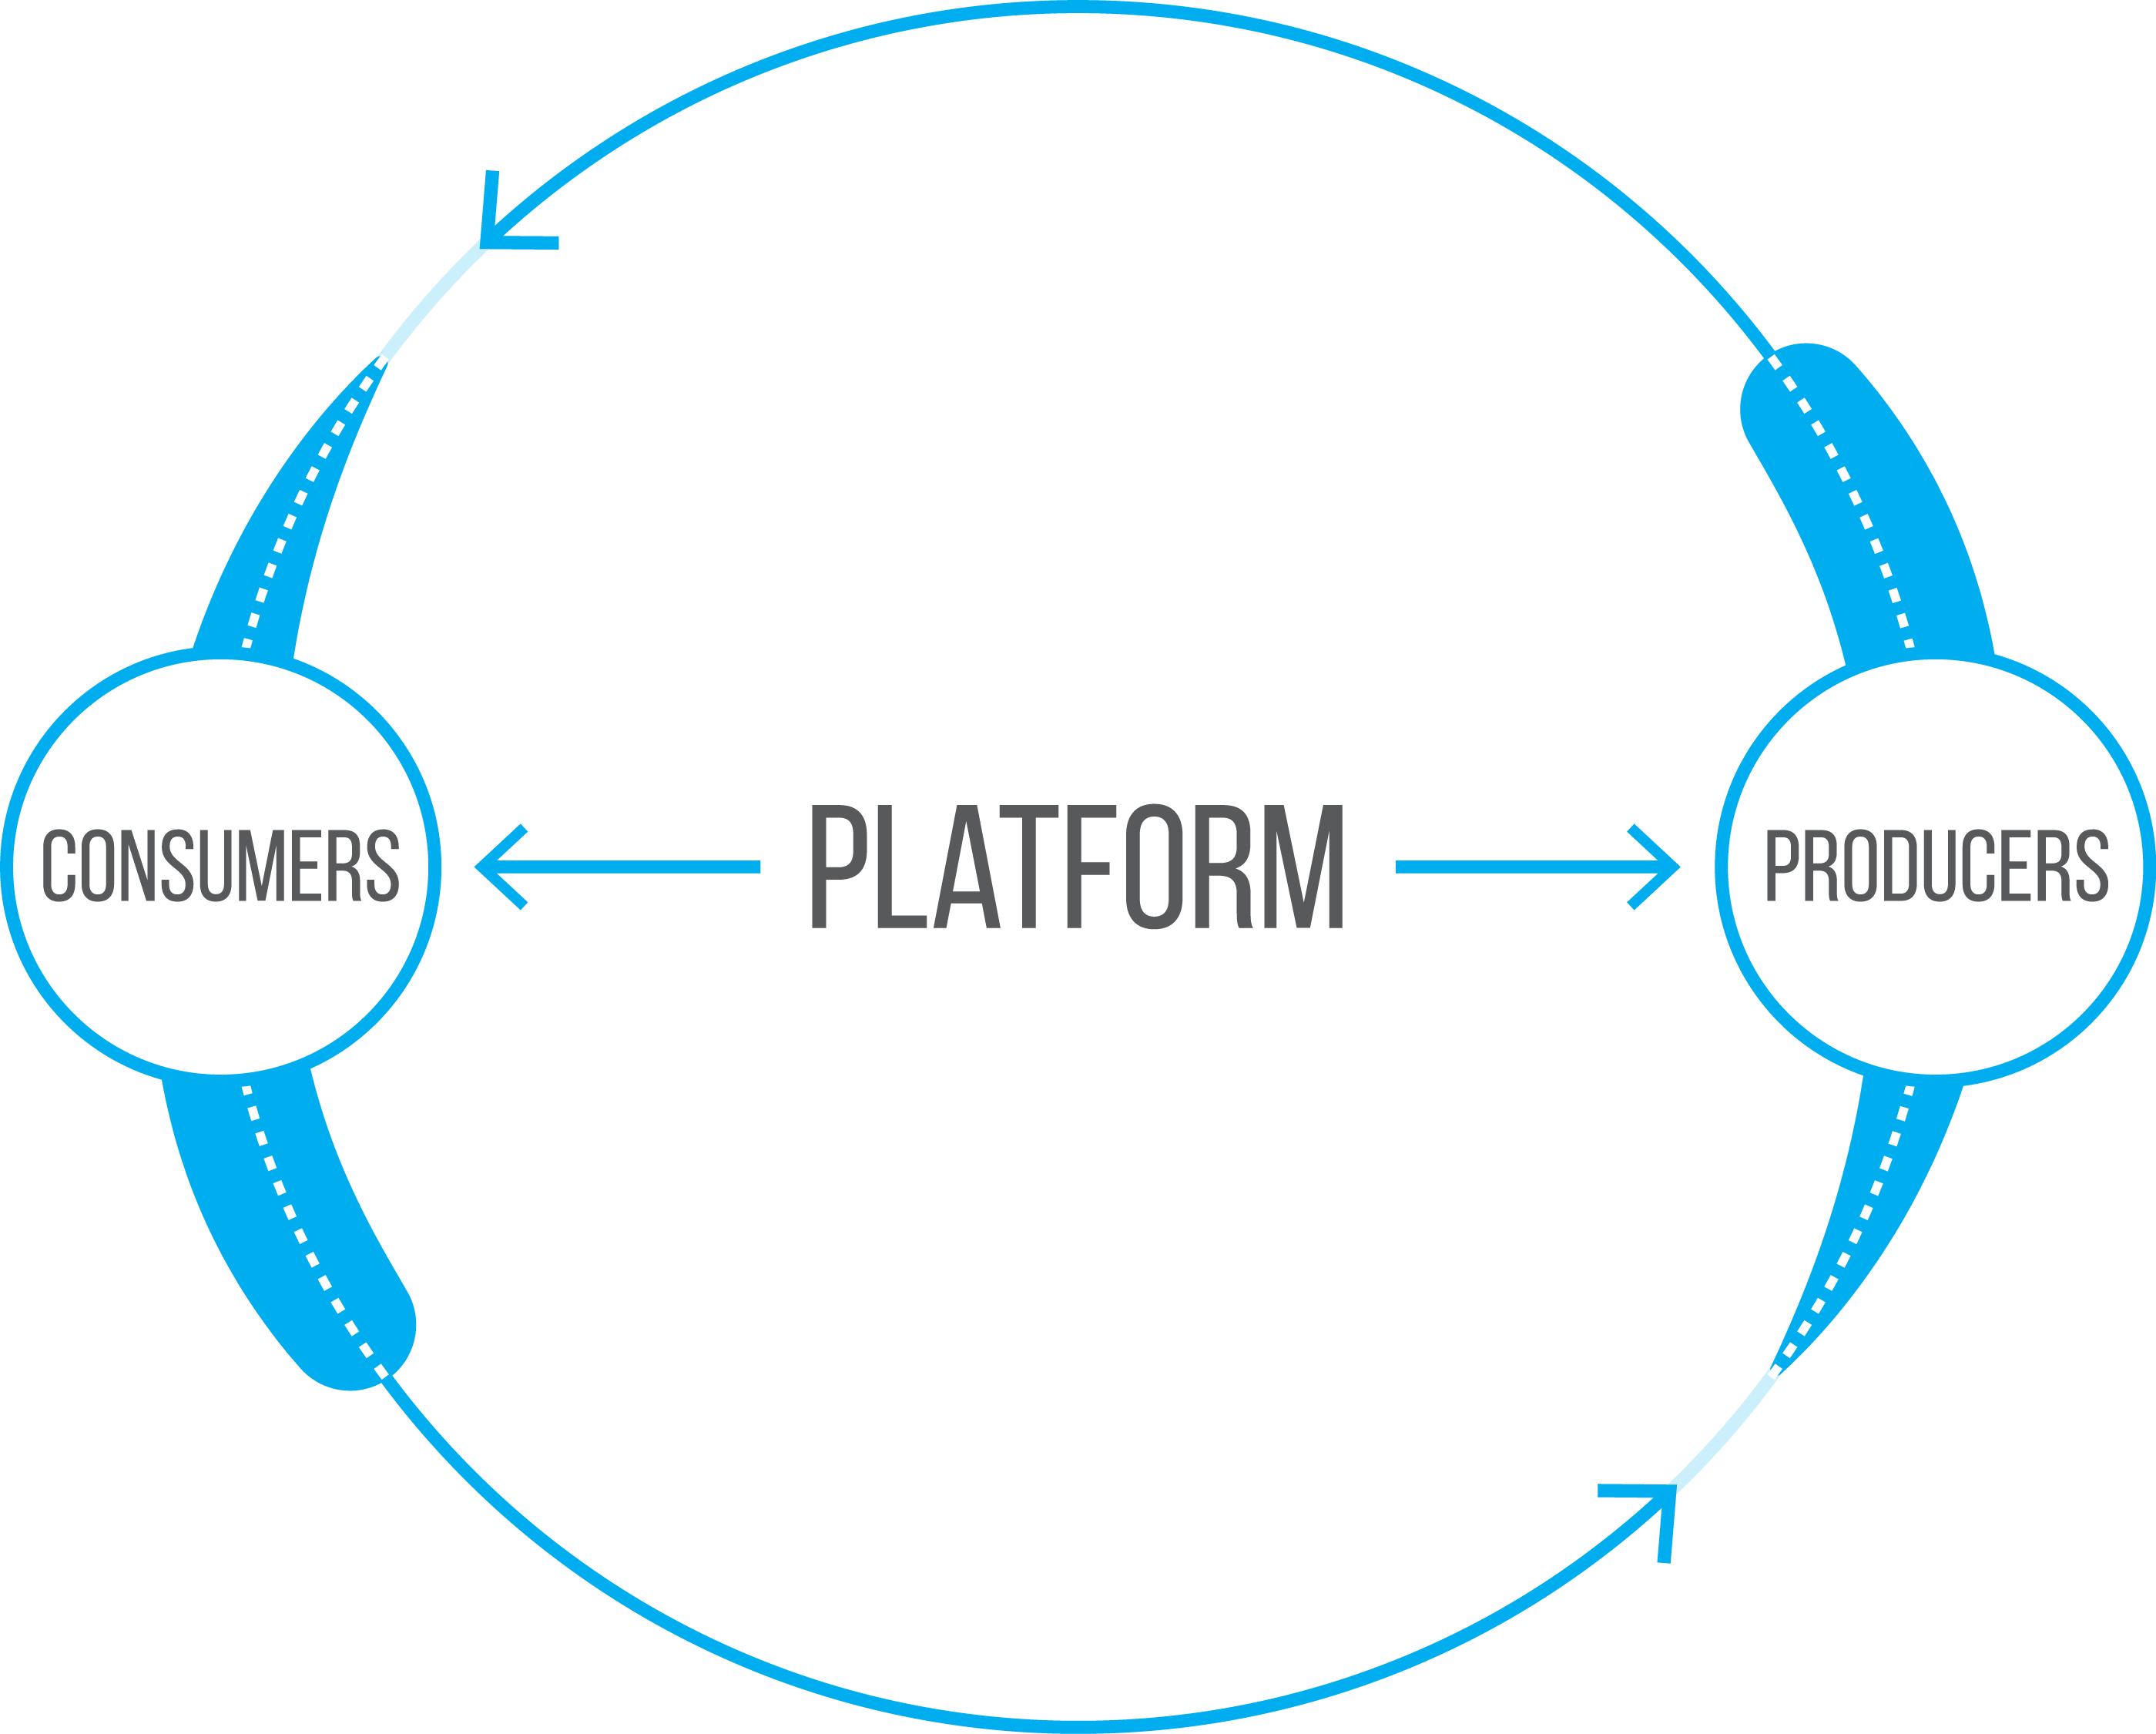 Platform-Business-Model | Branding from below